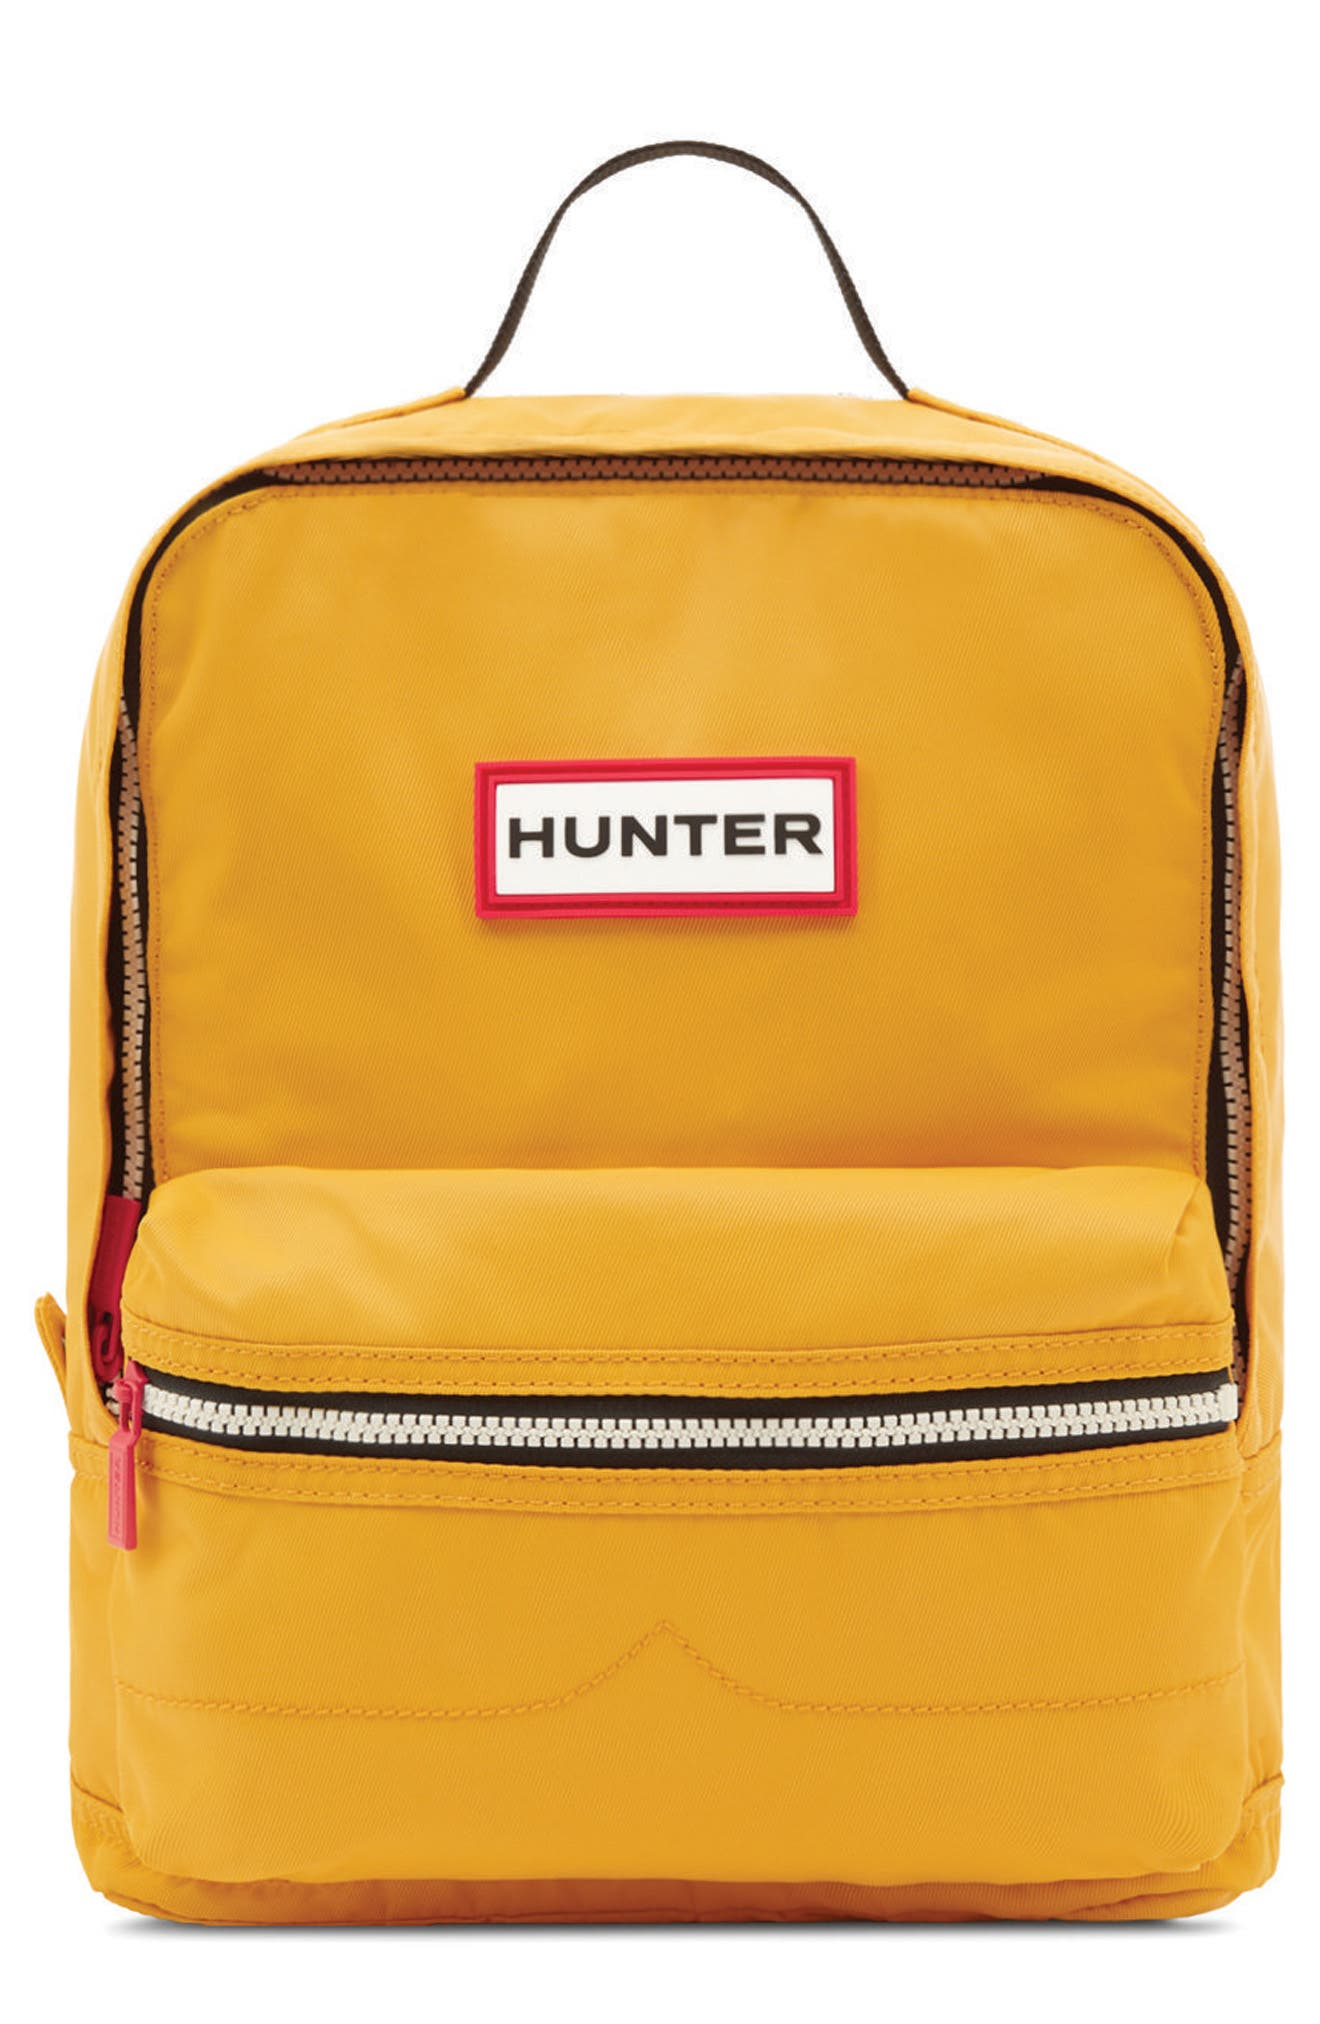 Original Water Resistant Nylon Backpack